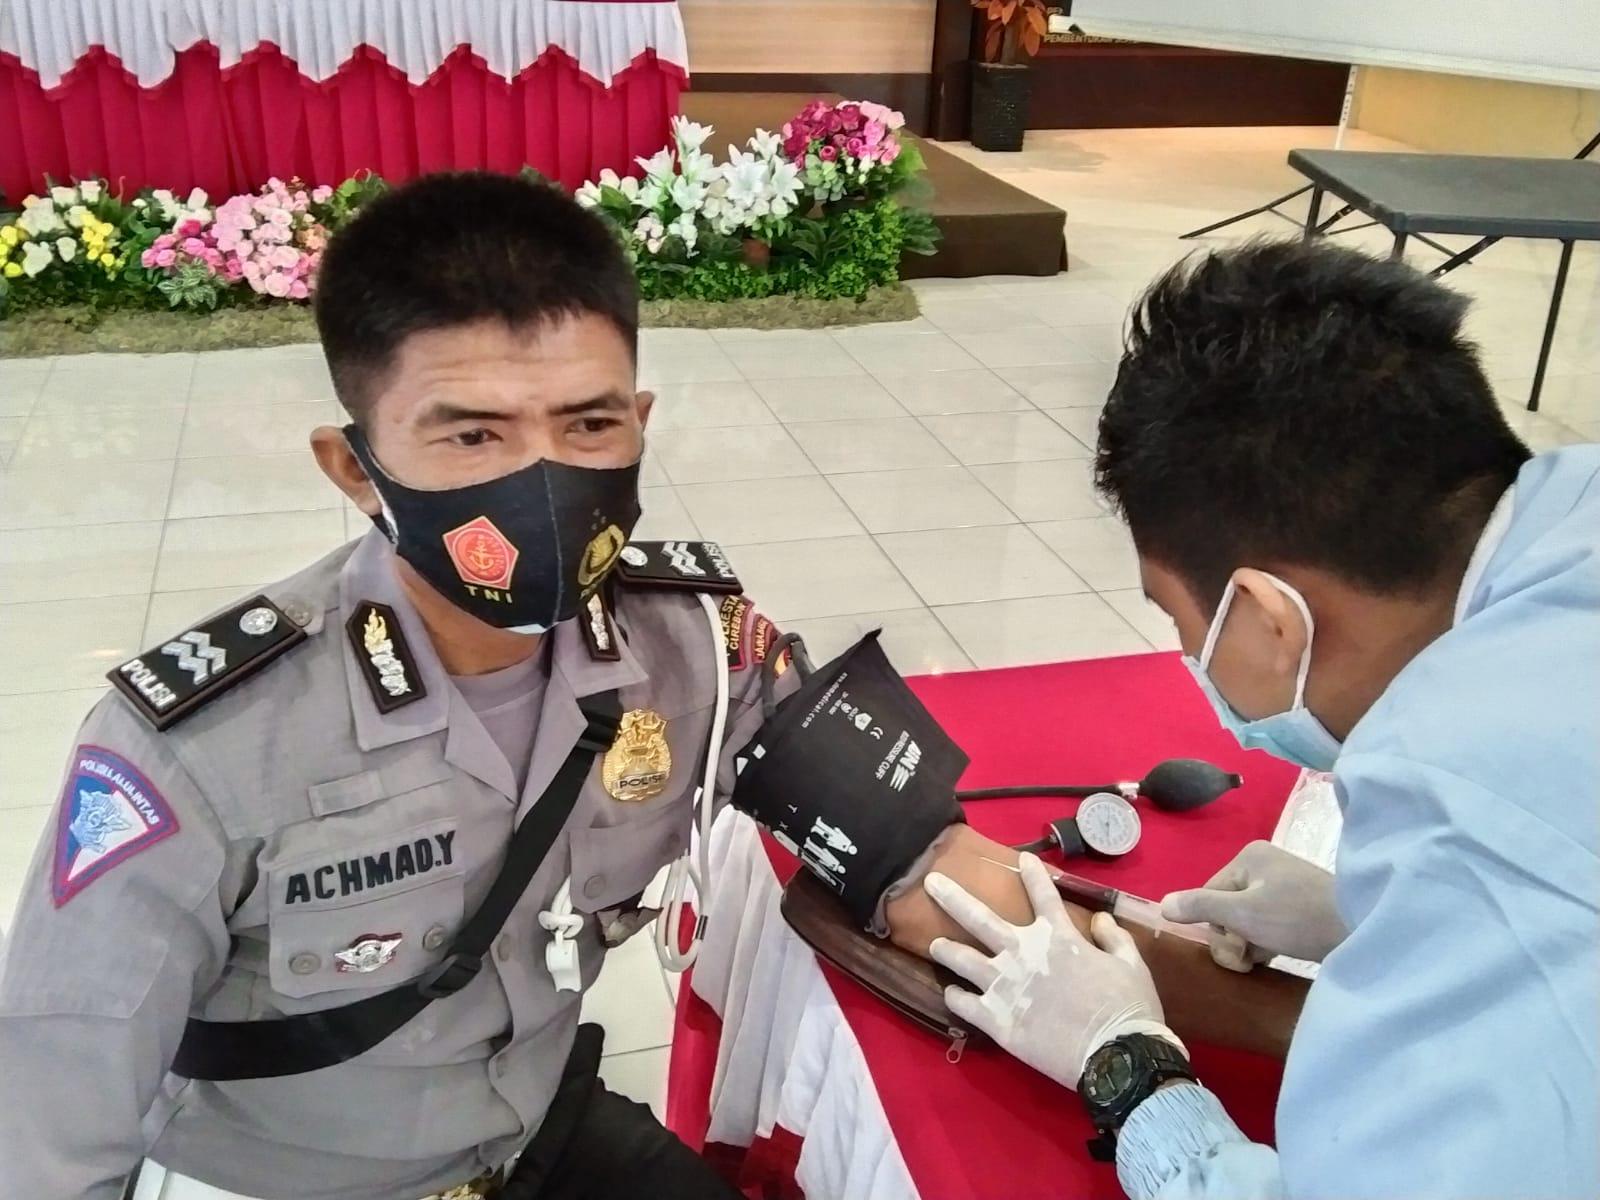 Polresta Cirebon Bantu Penanganan Pasien Covid-19 Melalui Donor Plasma Konvalesen